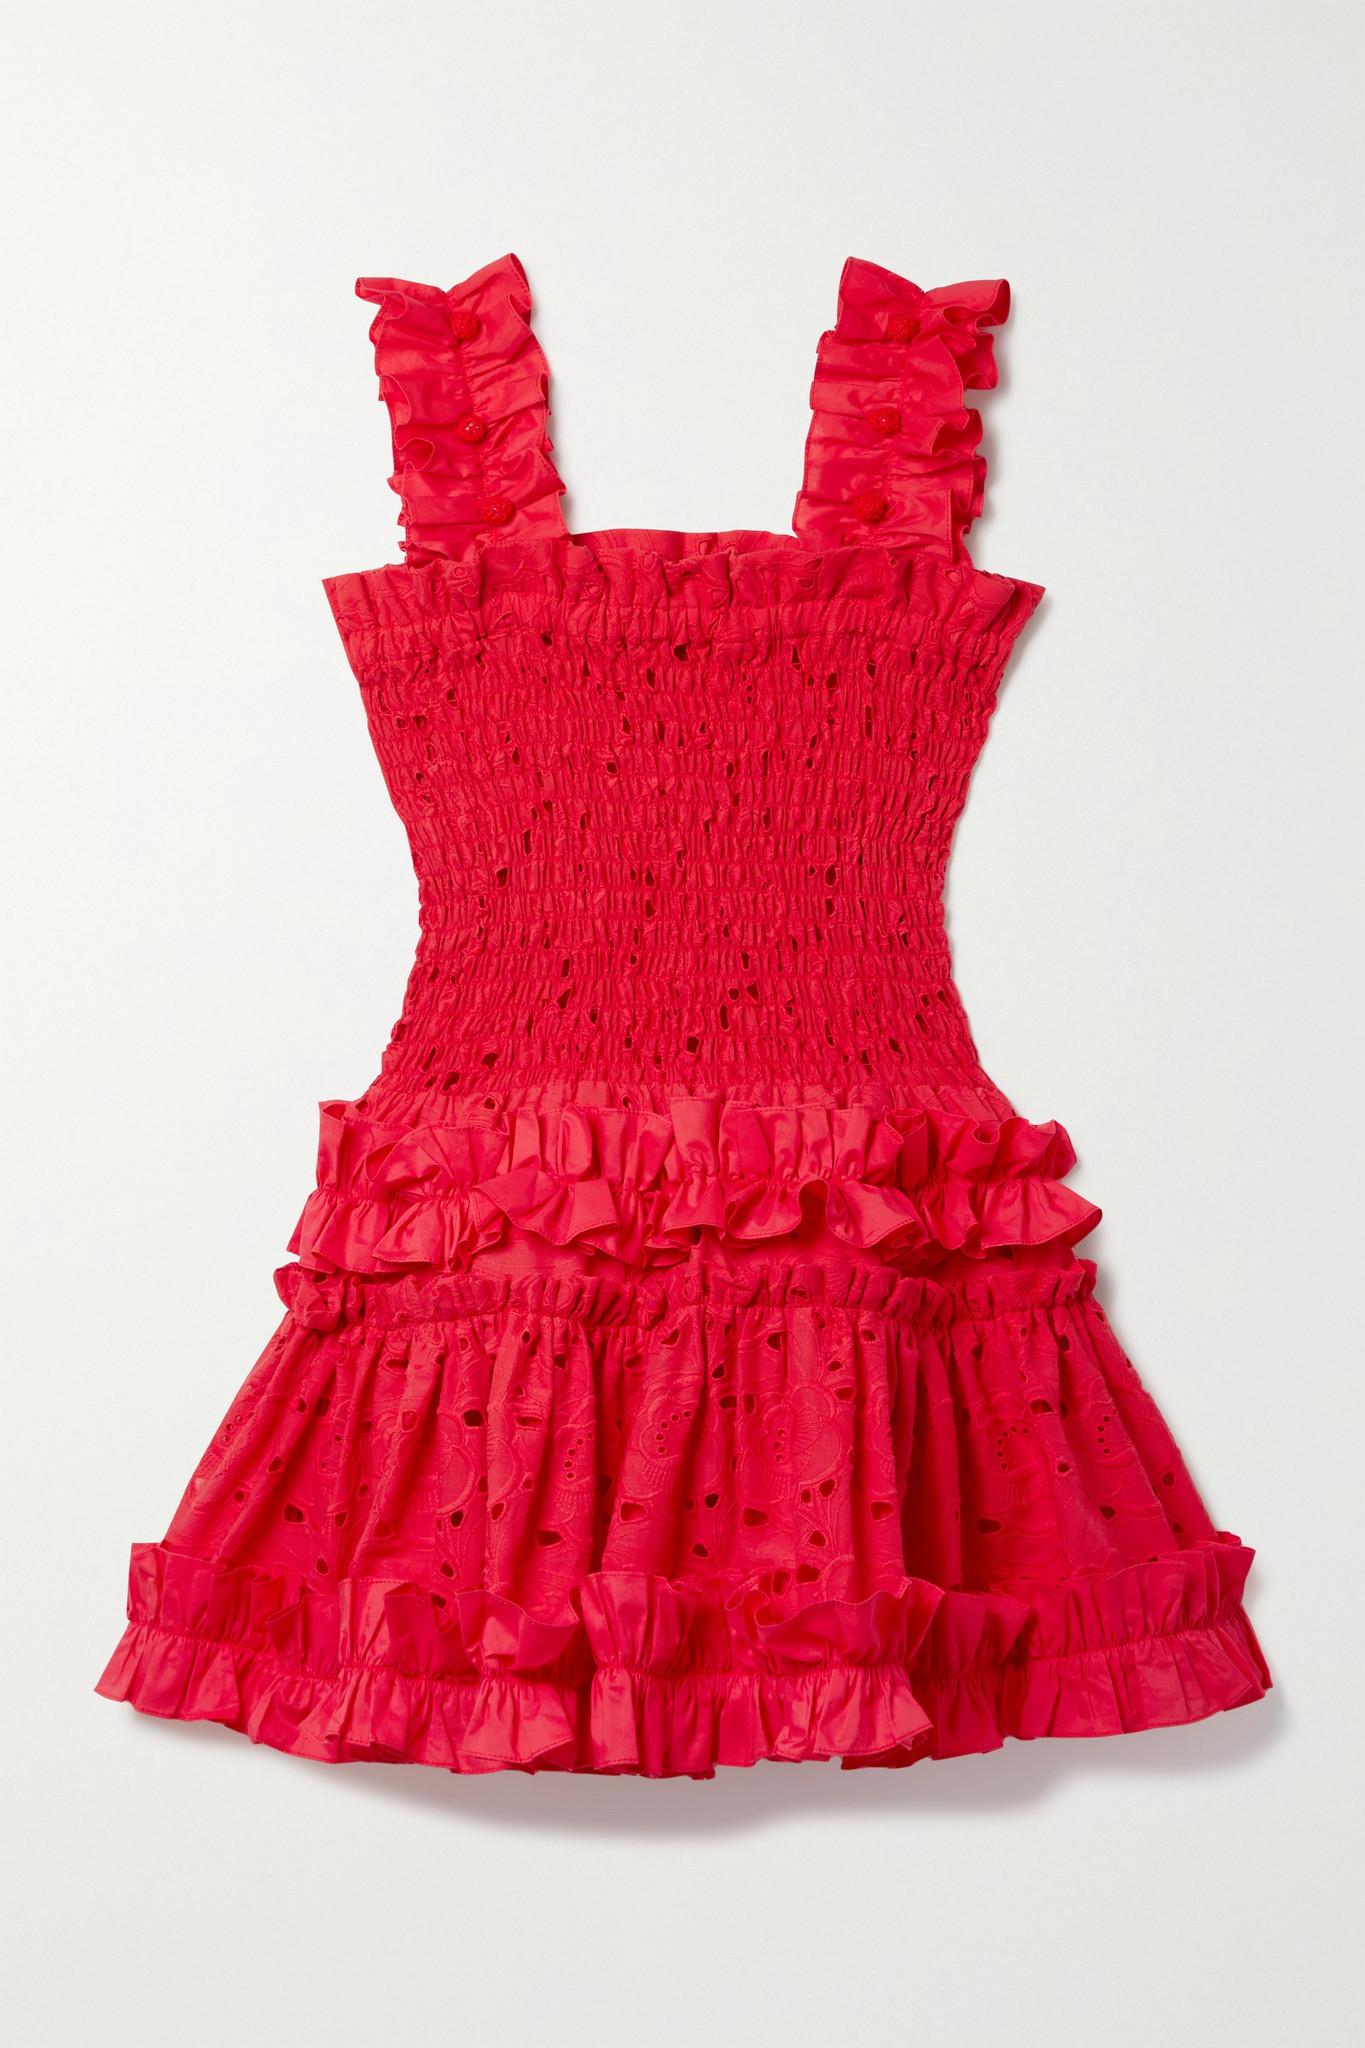 WAIMARI - + Net Sustain Alfresco Ruffled Broderie Anglaise Cotton Mini Dress - Red - large